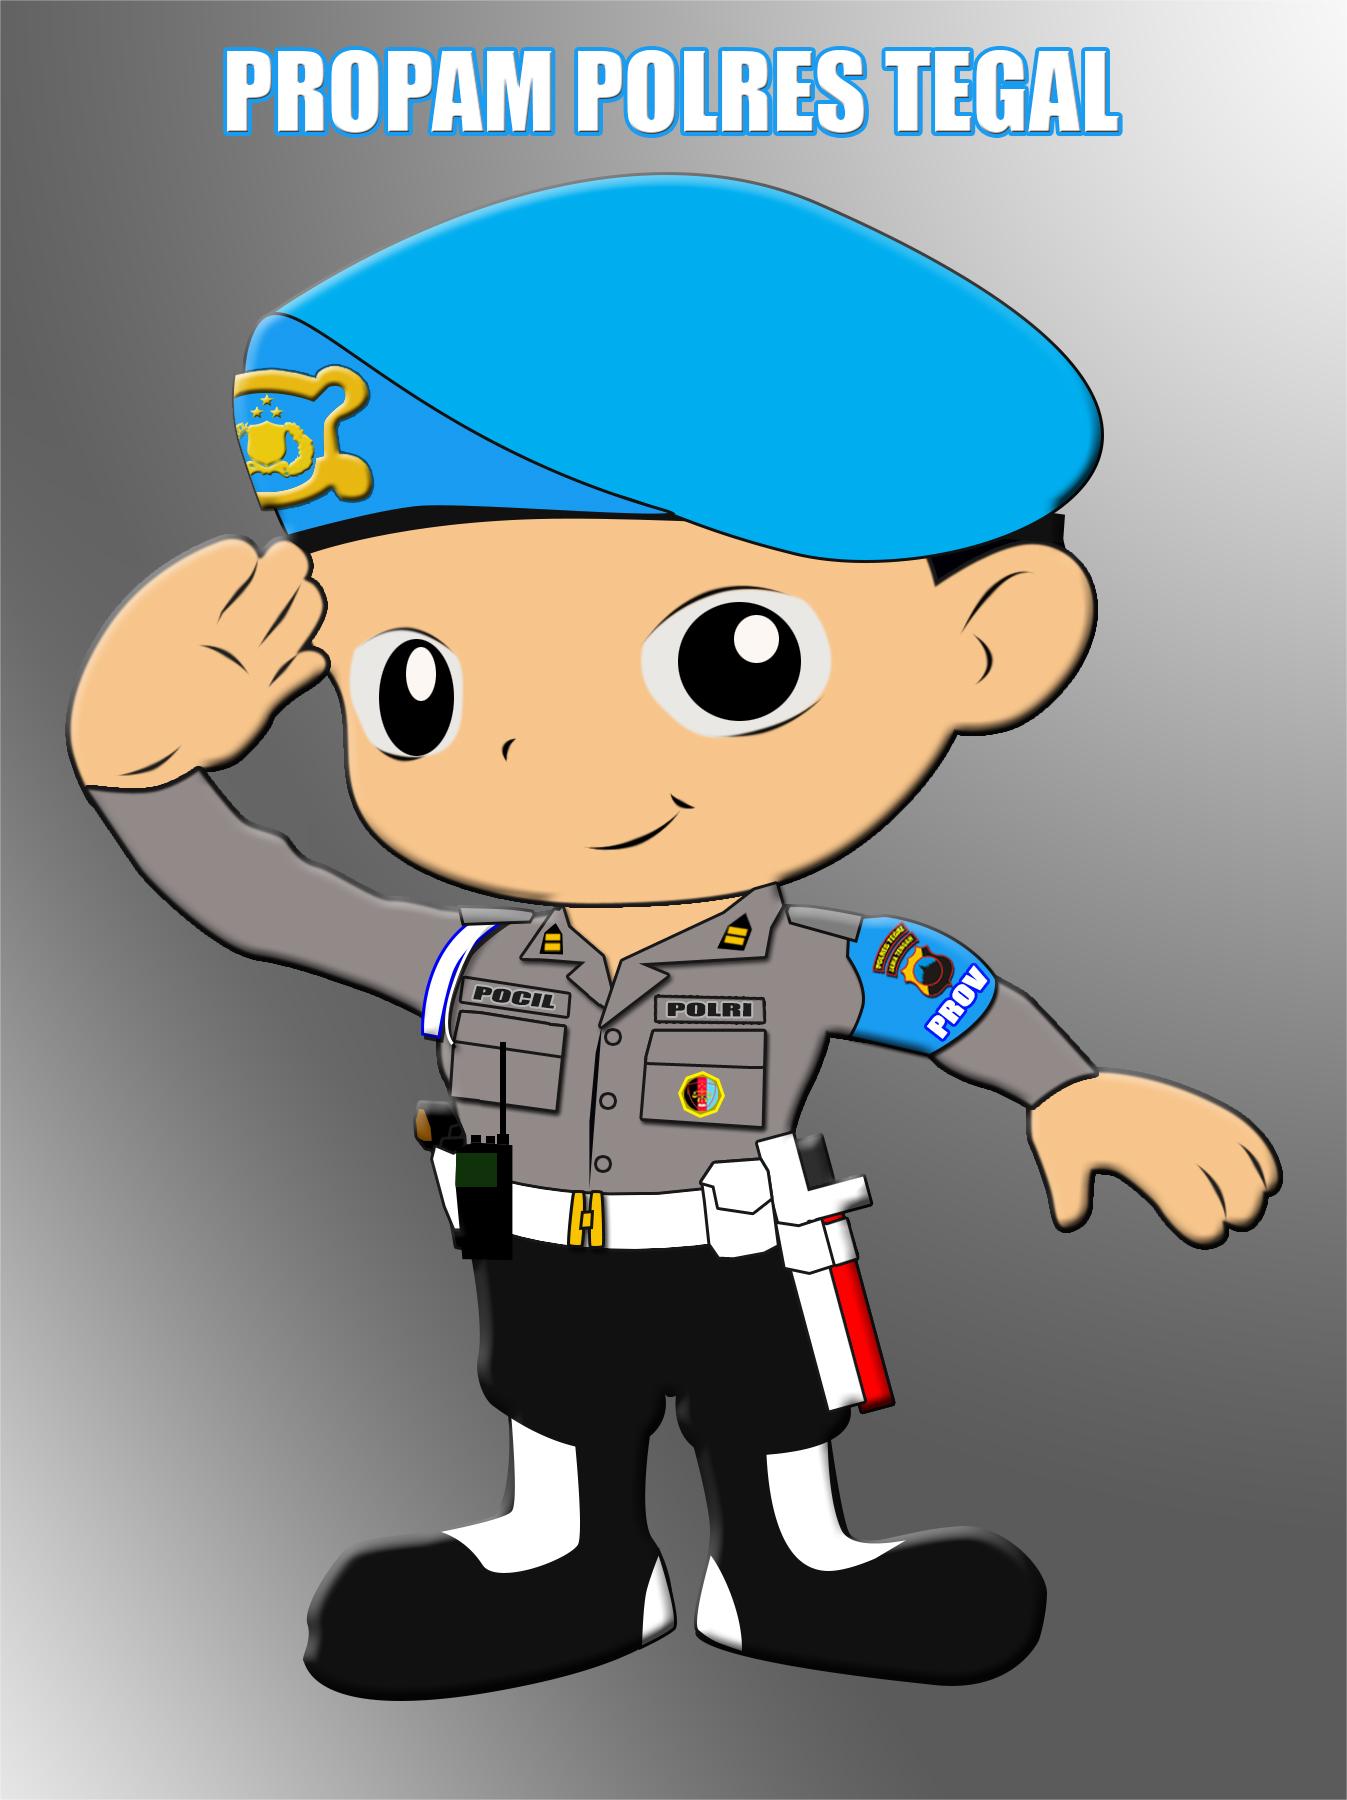 Koleksi Gambar Kartun Animasi Polisi Terbaru 2018 Sapawarga